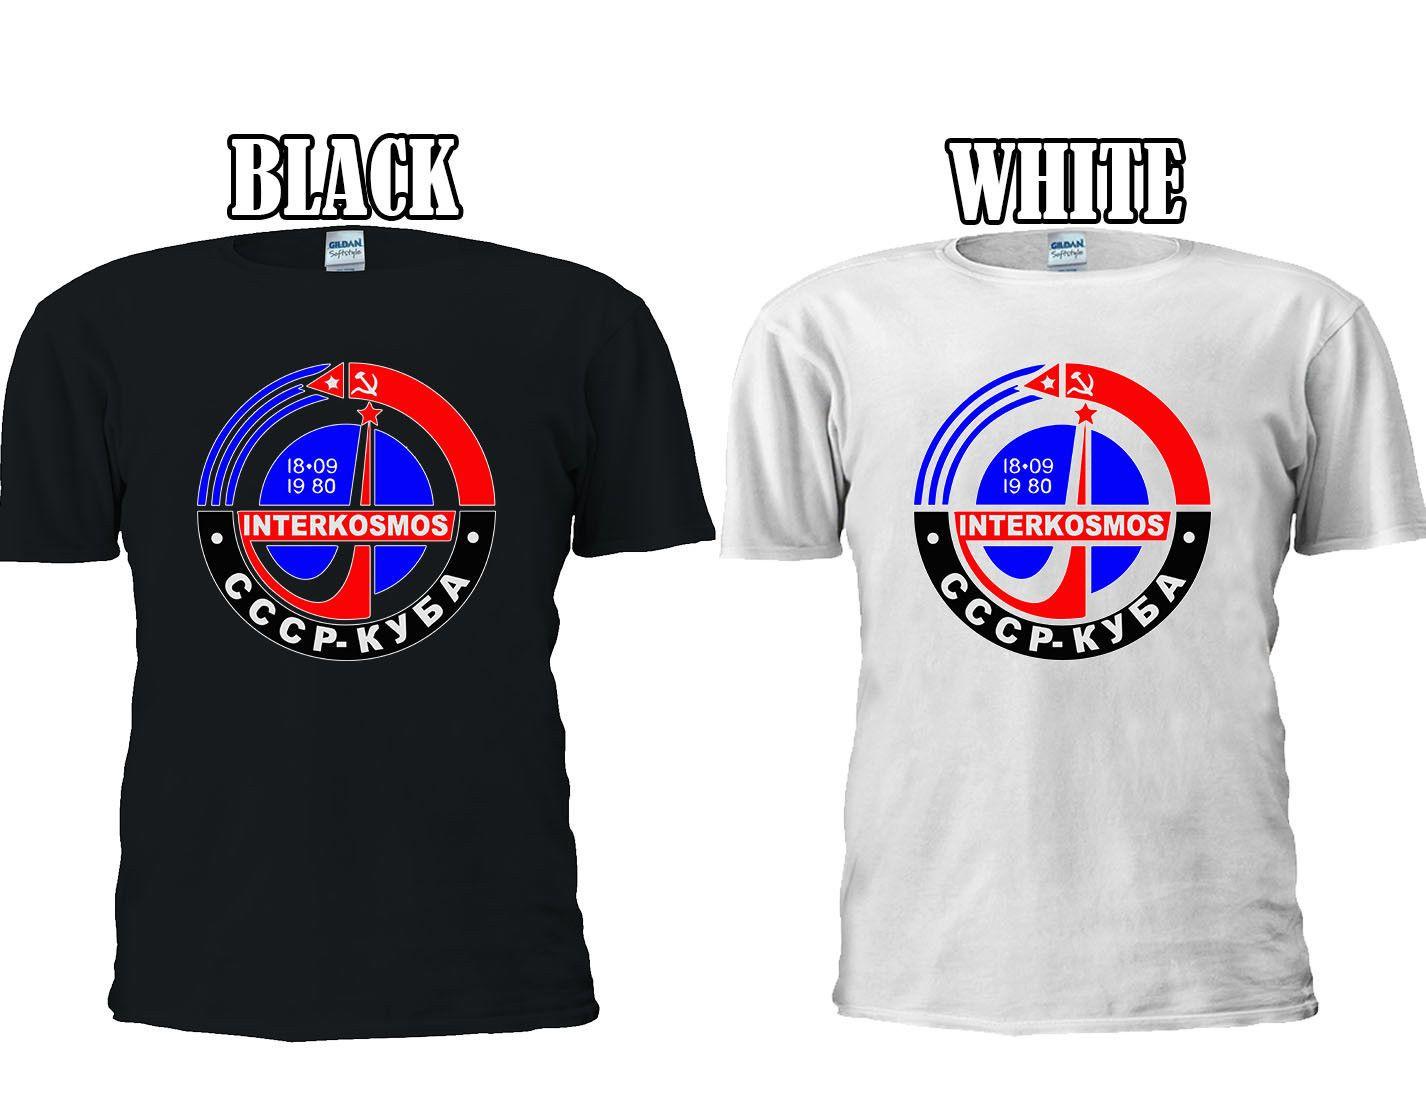 Intercosmos Logo Childrens Long Sleeve T-Shirt Boys Cotton Tee Tops